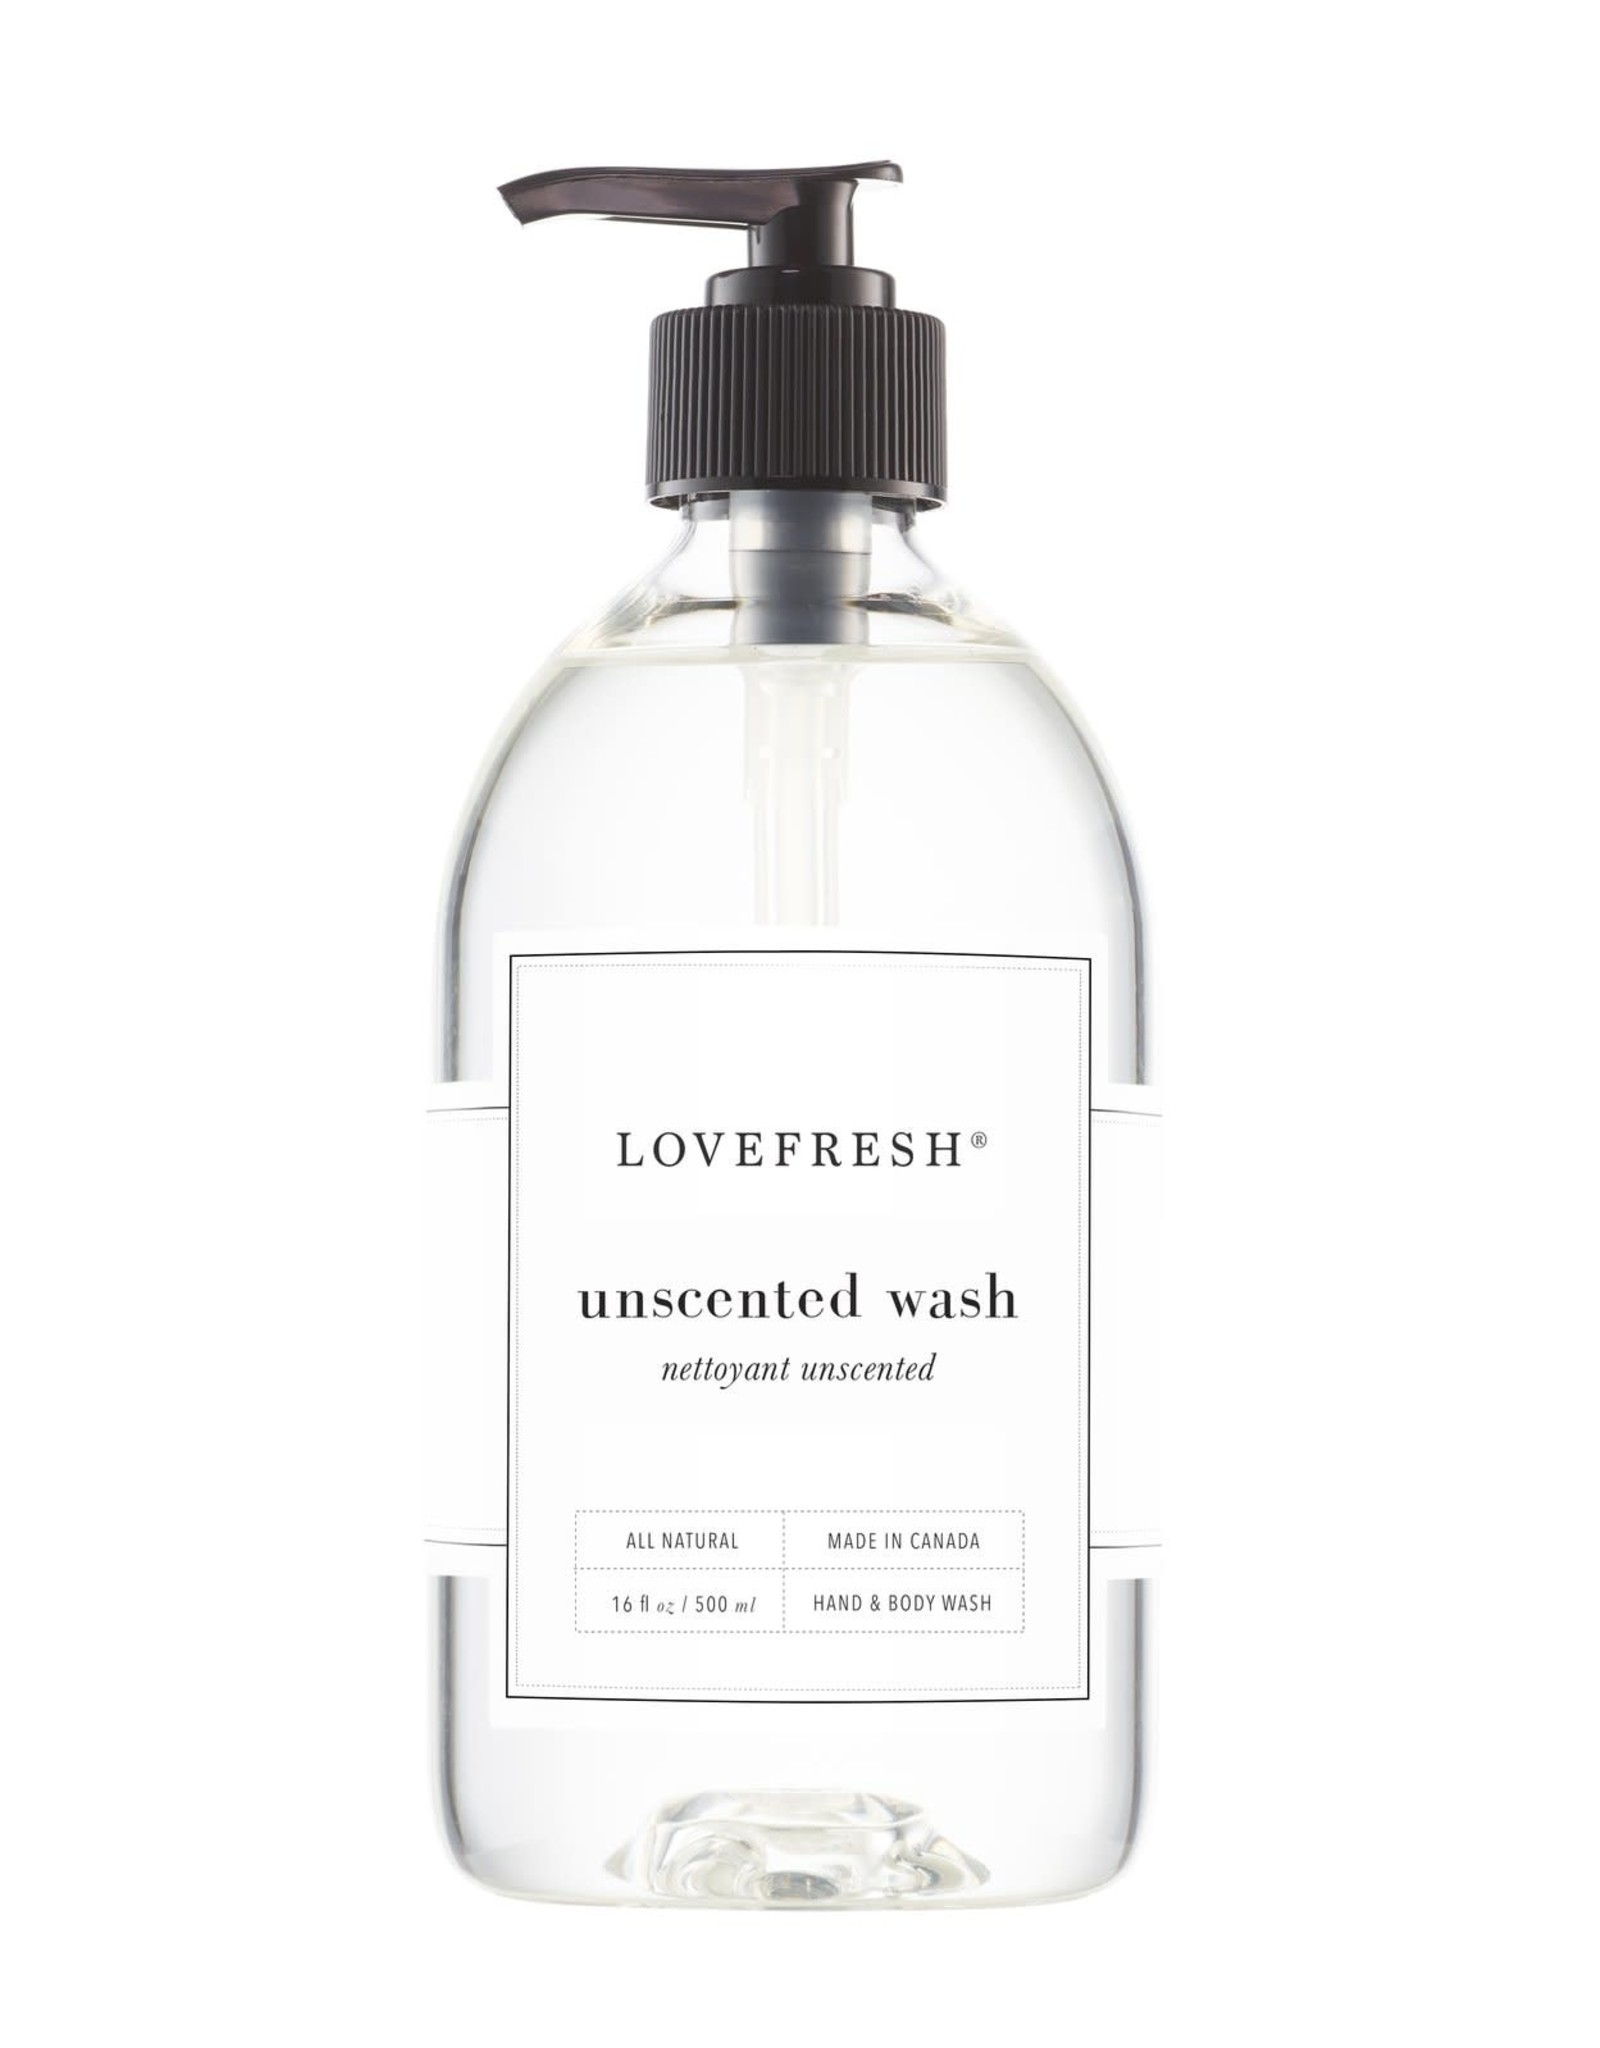 Lovefresh Hand & Body Wash